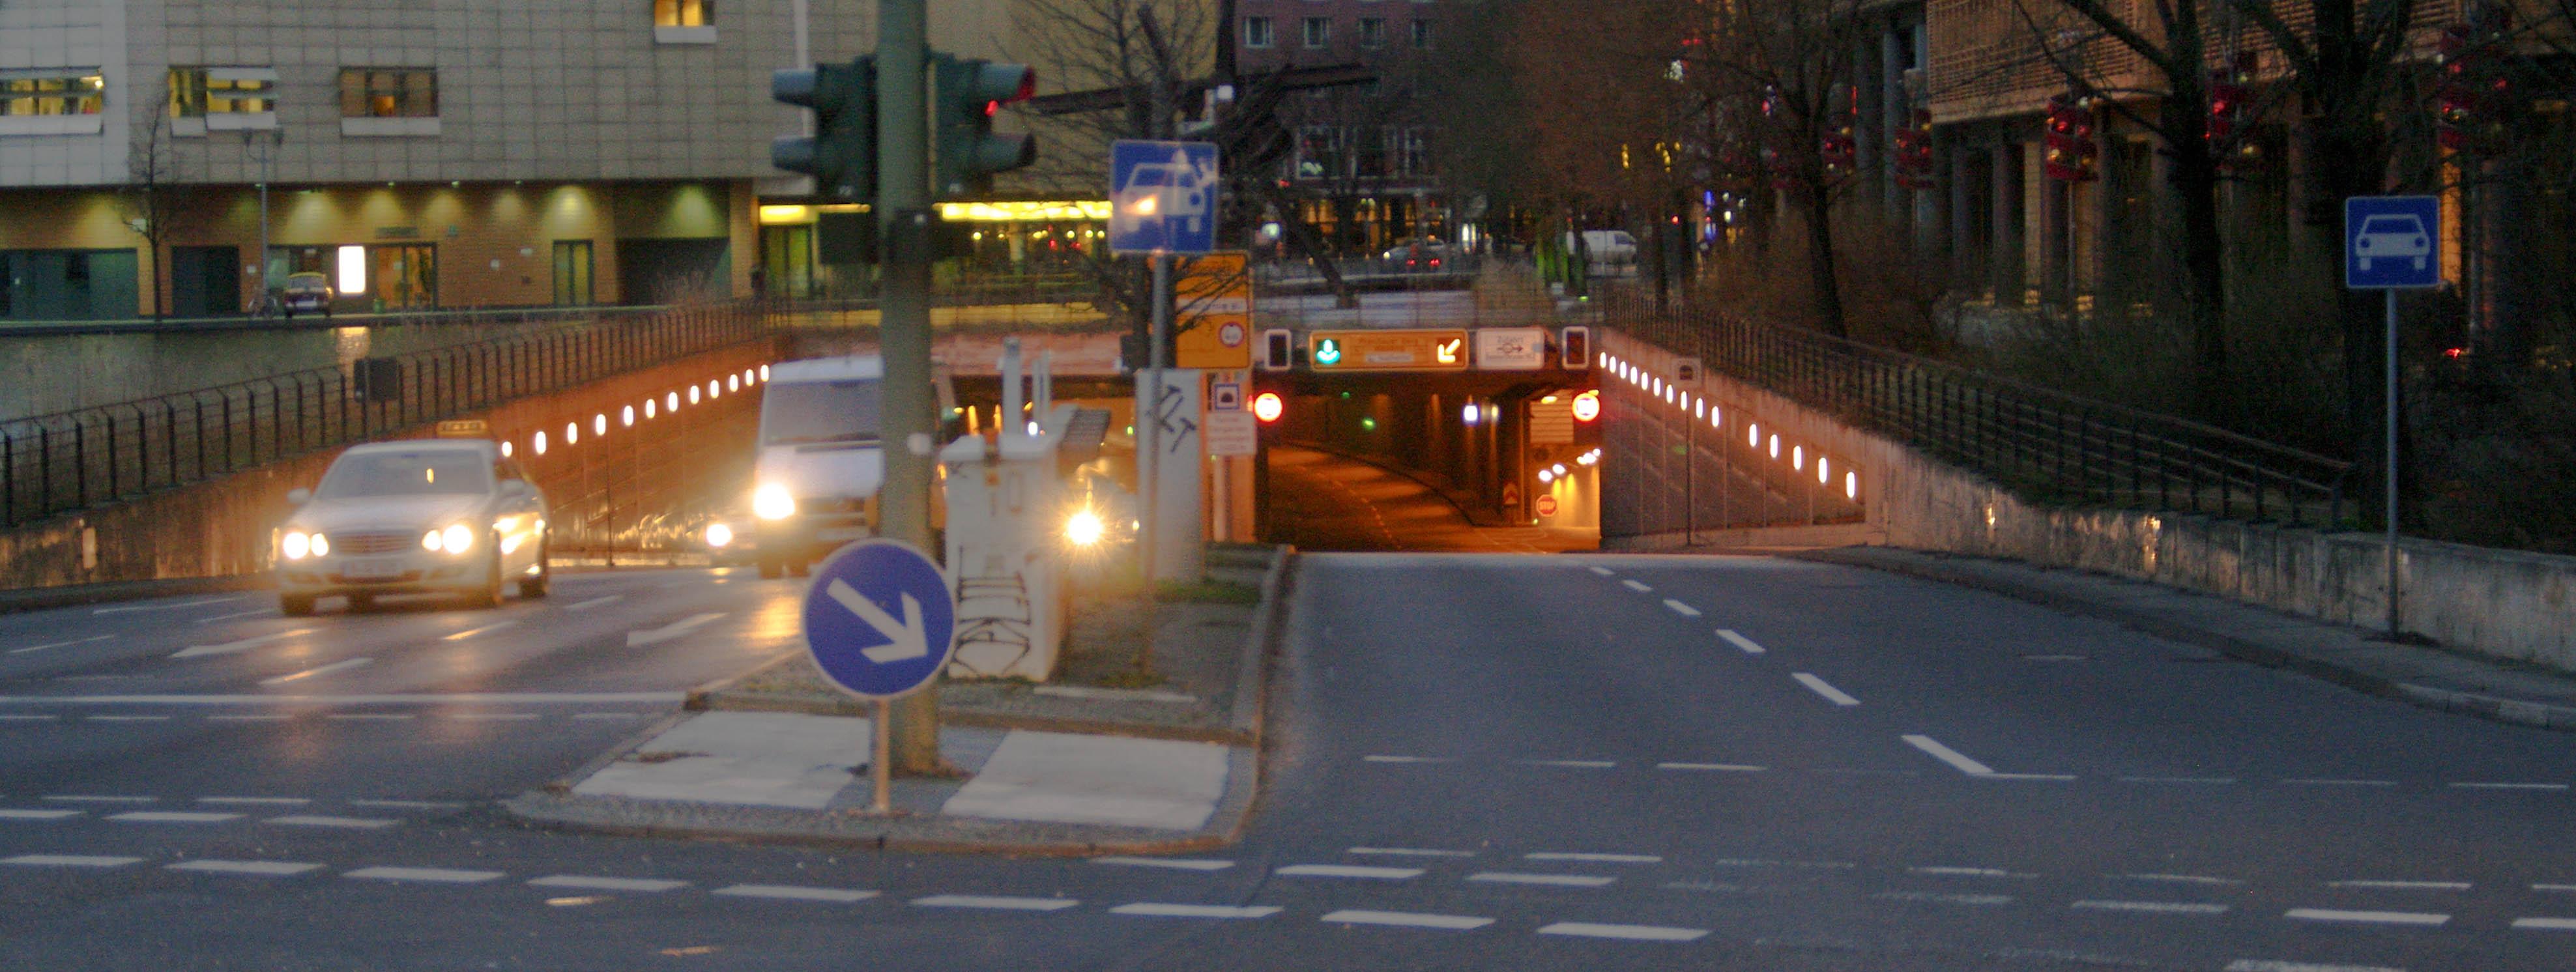 Berlin_Potsdamer_Platz_Tiergartentunnel_13.01.2015_17-32-23